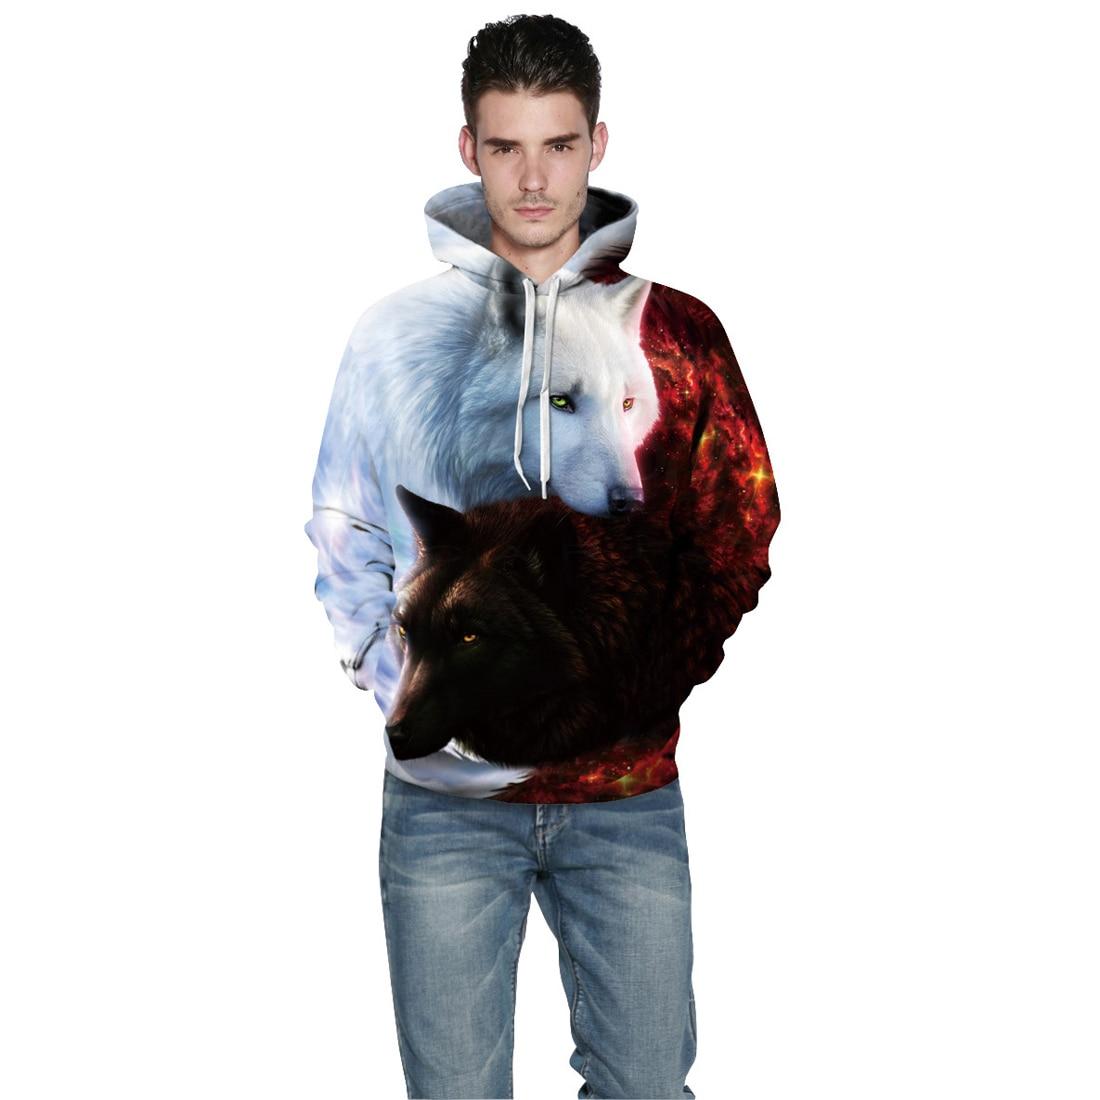 YJSFG HOUSE Mens 3D Hoodie Couples clothes Sweat Animal Wolf Sweatshirt Hoody Pullover Print Long Sleeve Top Hot Coat Sportswear